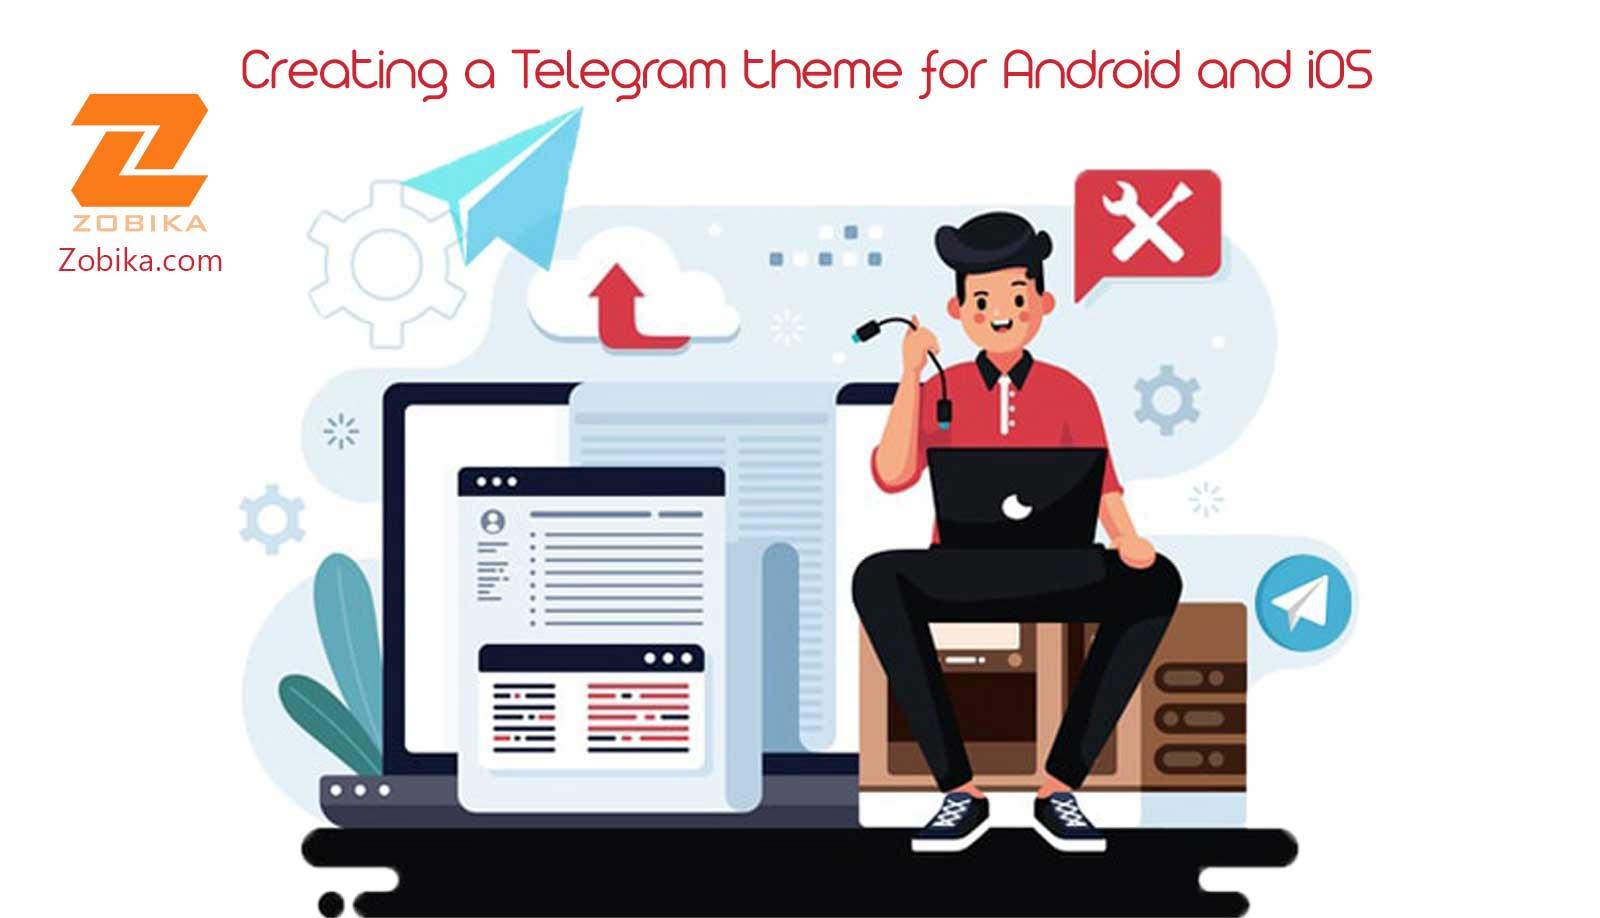 Creating a Telegram theme